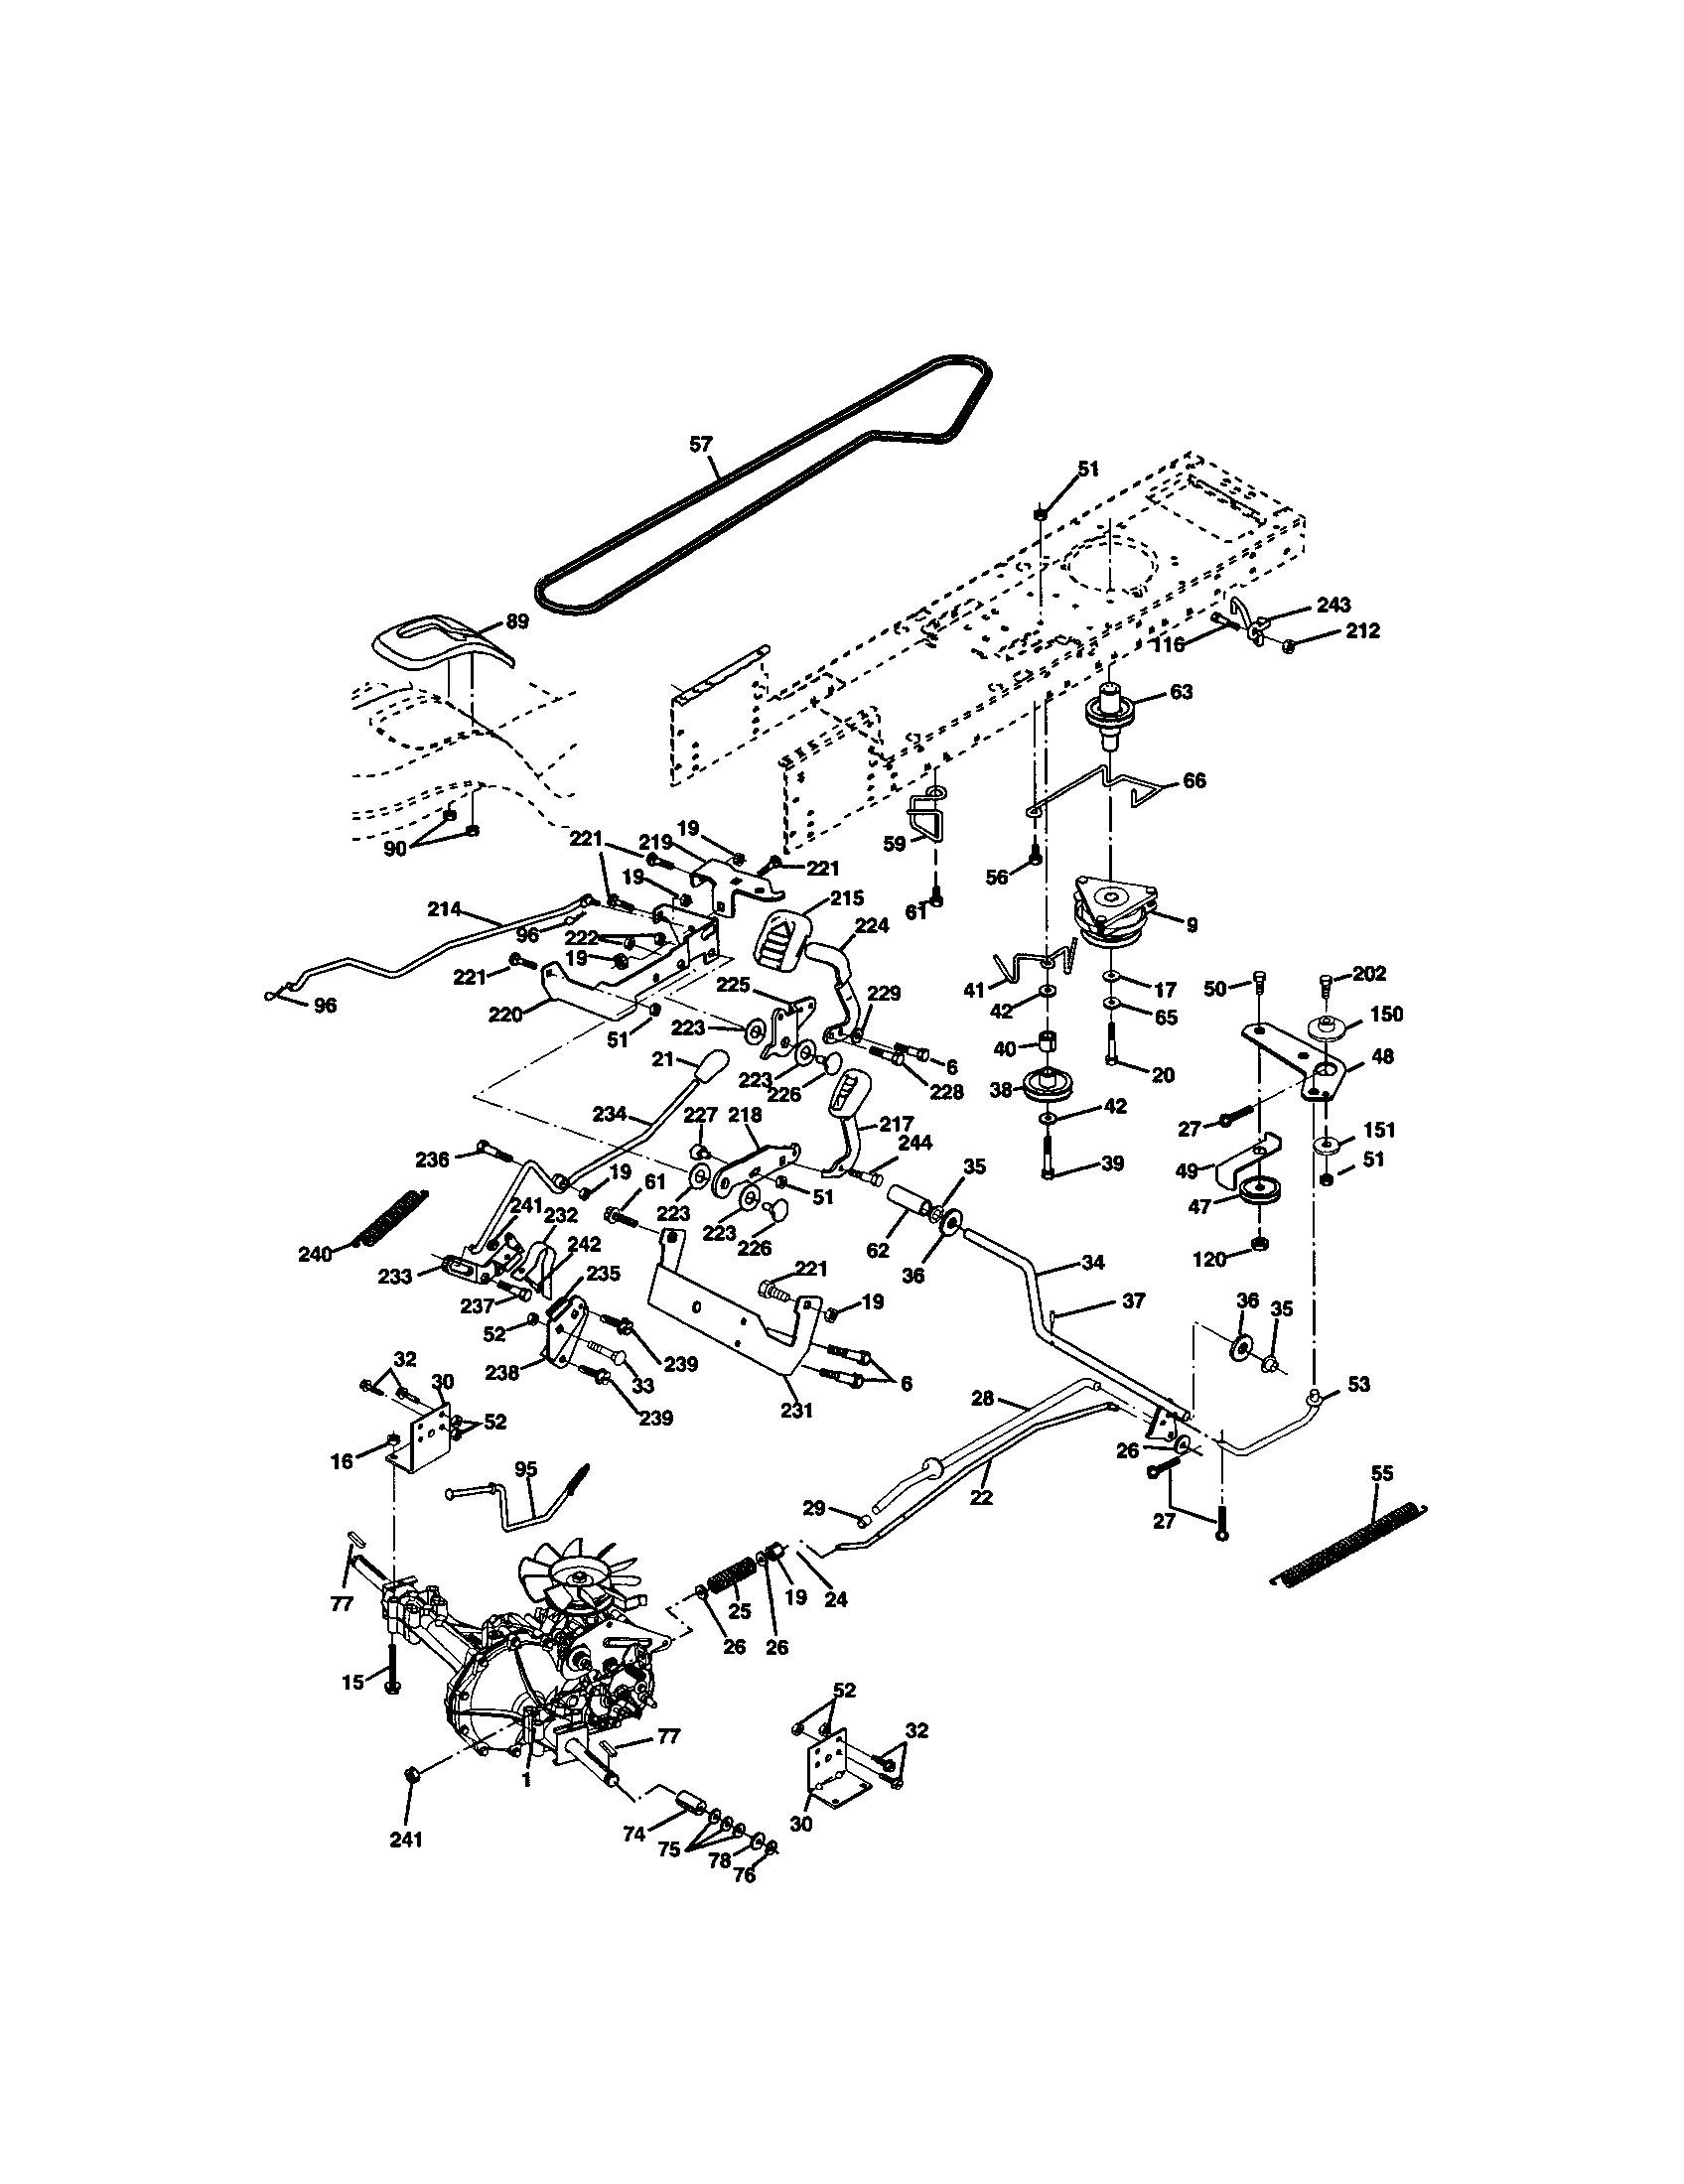 Craftsman Lawn Mower Parts Diagram 917 Craftsman 20 0 Hp Electric Start 48 In Mower Automatic Of Craftsman Lawn Mower Parts Diagram